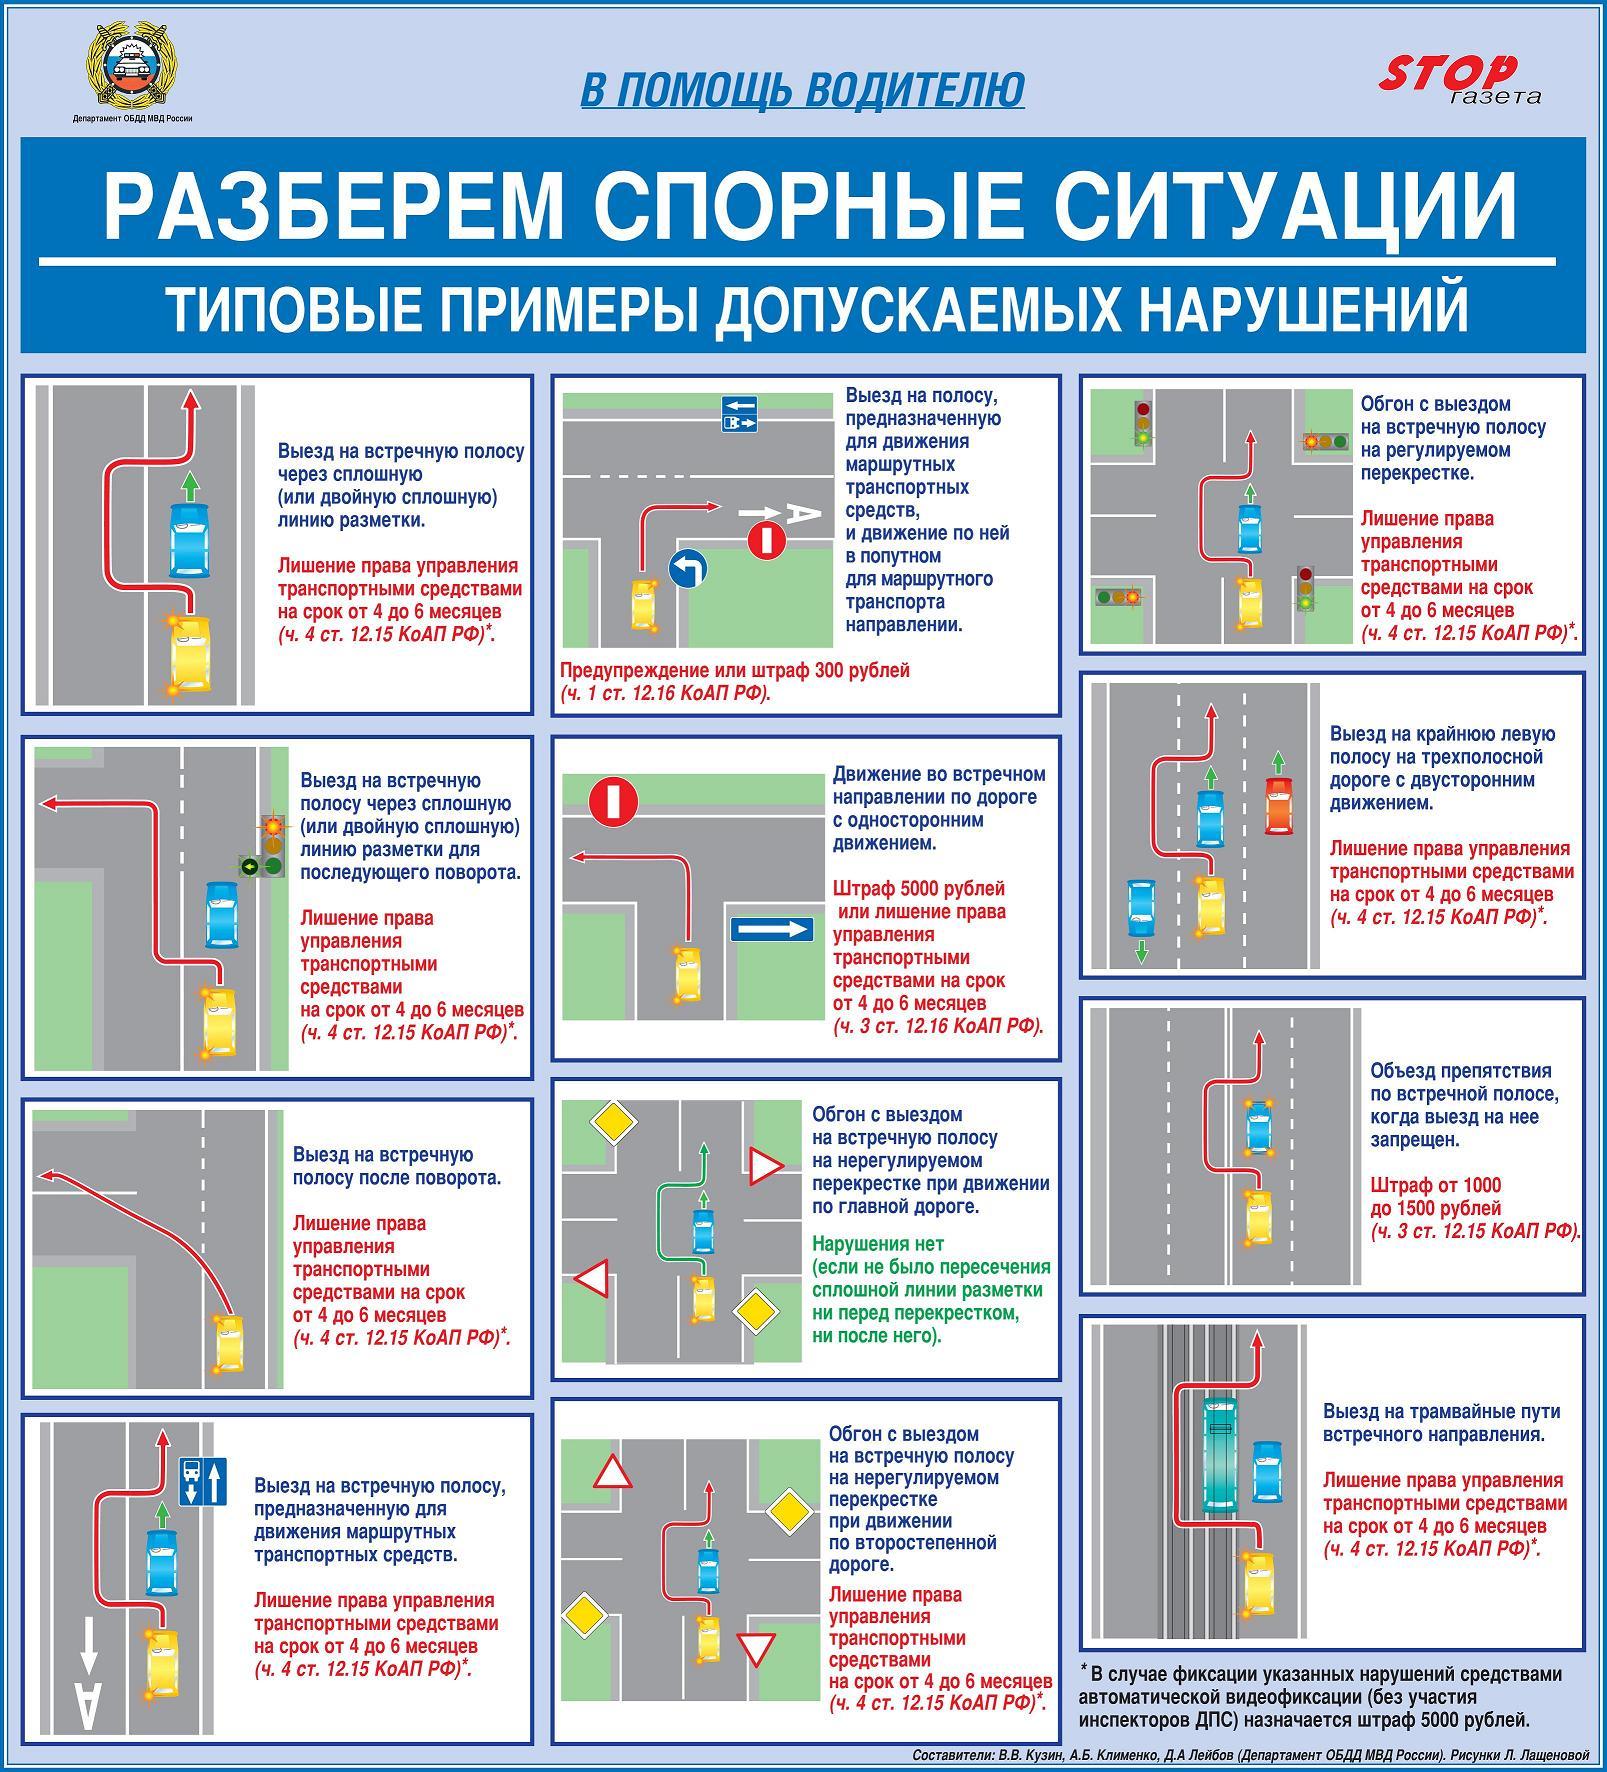 NewsLine.PrintPage - УГИБДД МВД по Марий Эл.